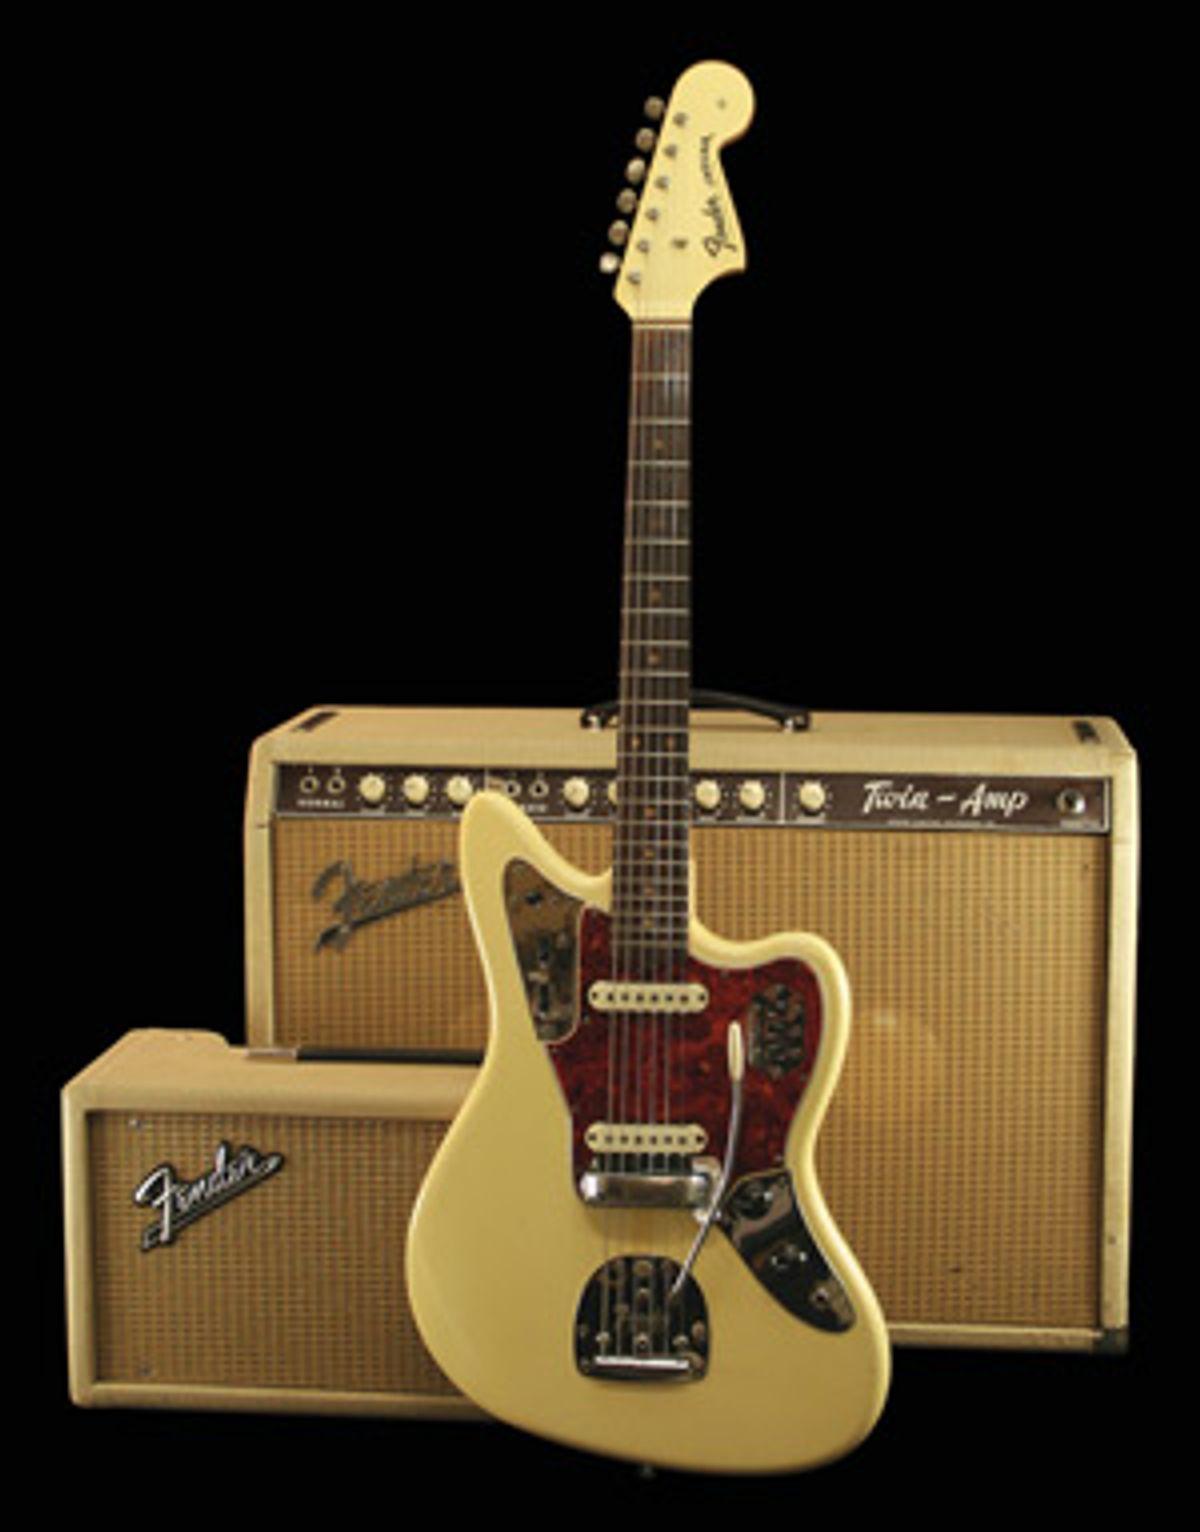 1963 Fender Twin-Amp Model 6G8-A